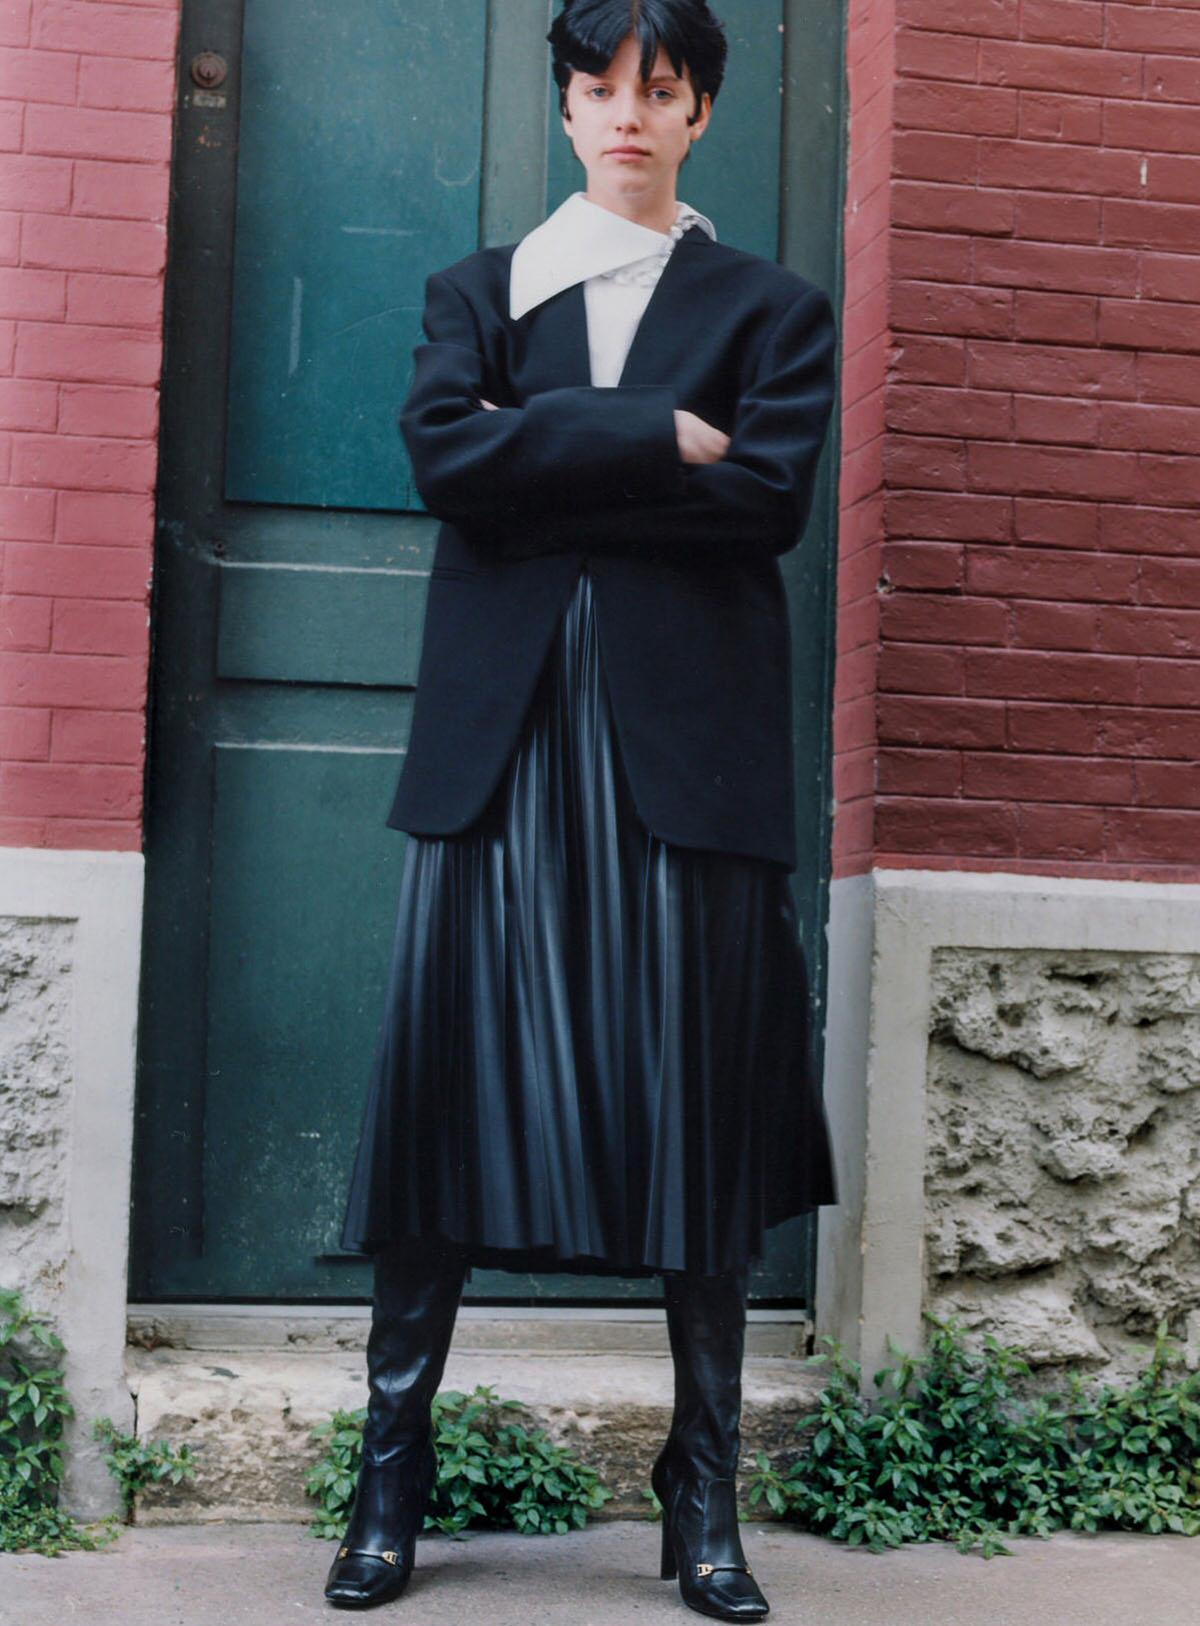 Yuki van Gog by Valentin B. Giacobetti for Vanity Fair France July 2021